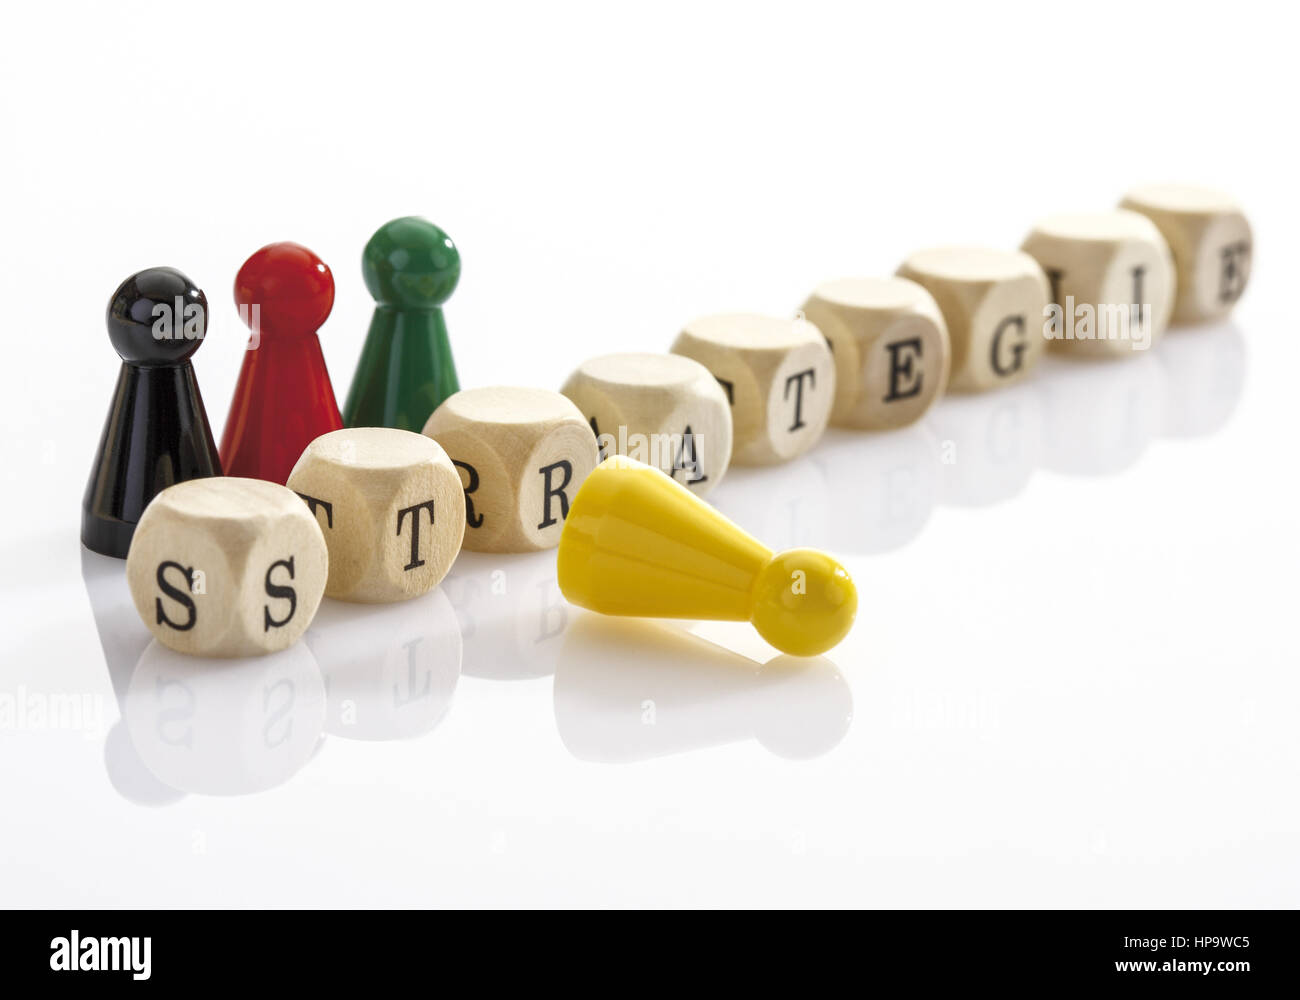 Wort Strategie aus Scrabble-Wuerfeln gebildet, Halmafiguren - Stock Image